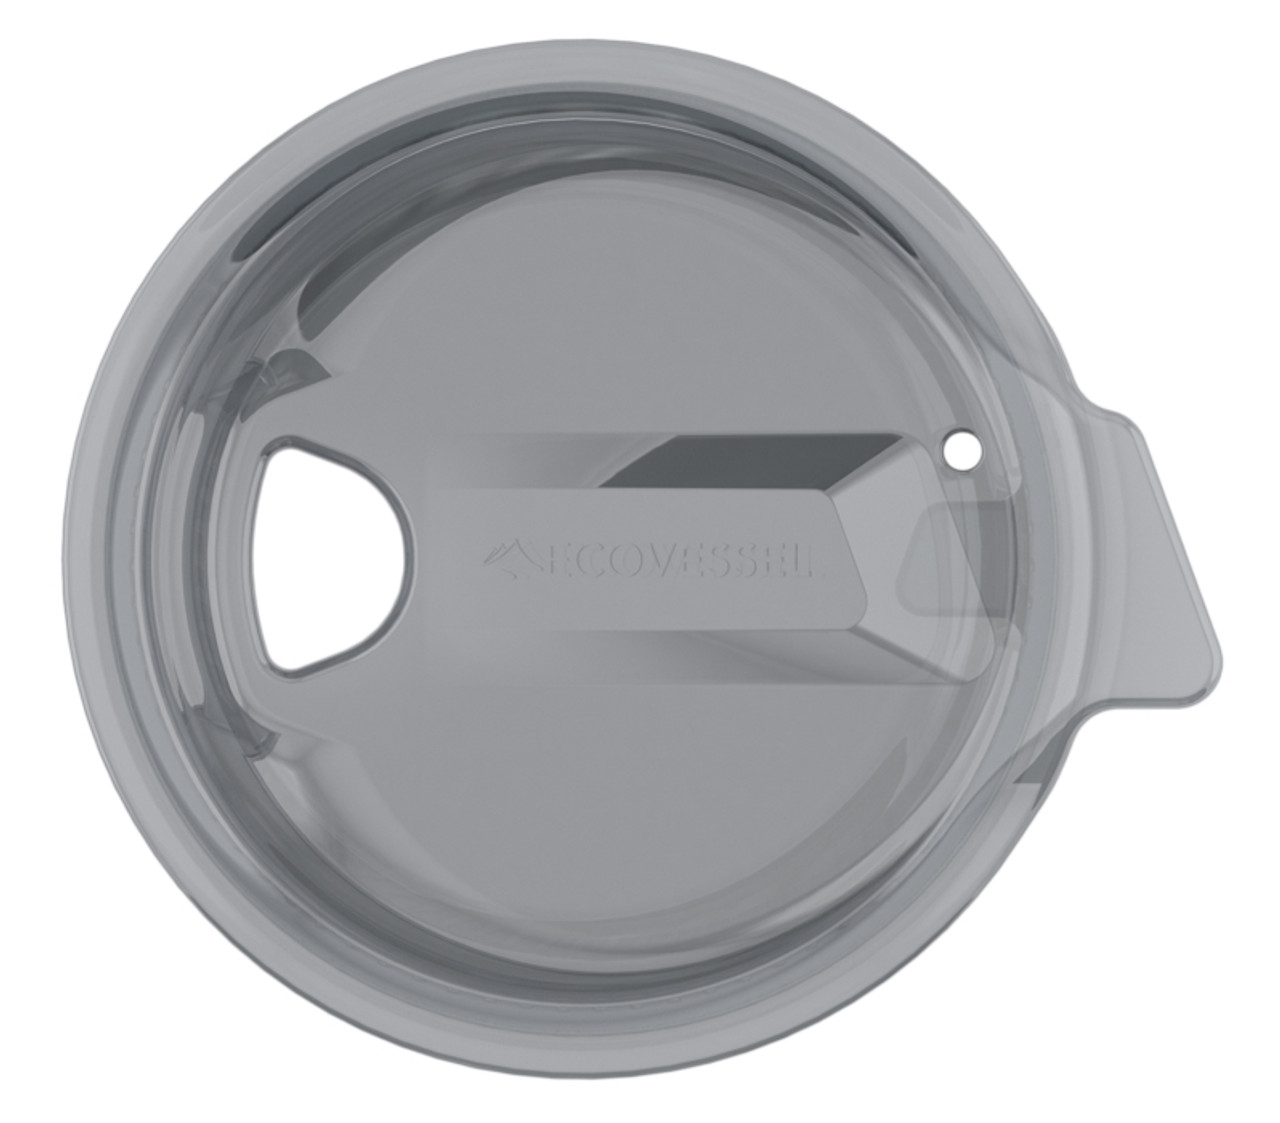 Easy clean drinking lid